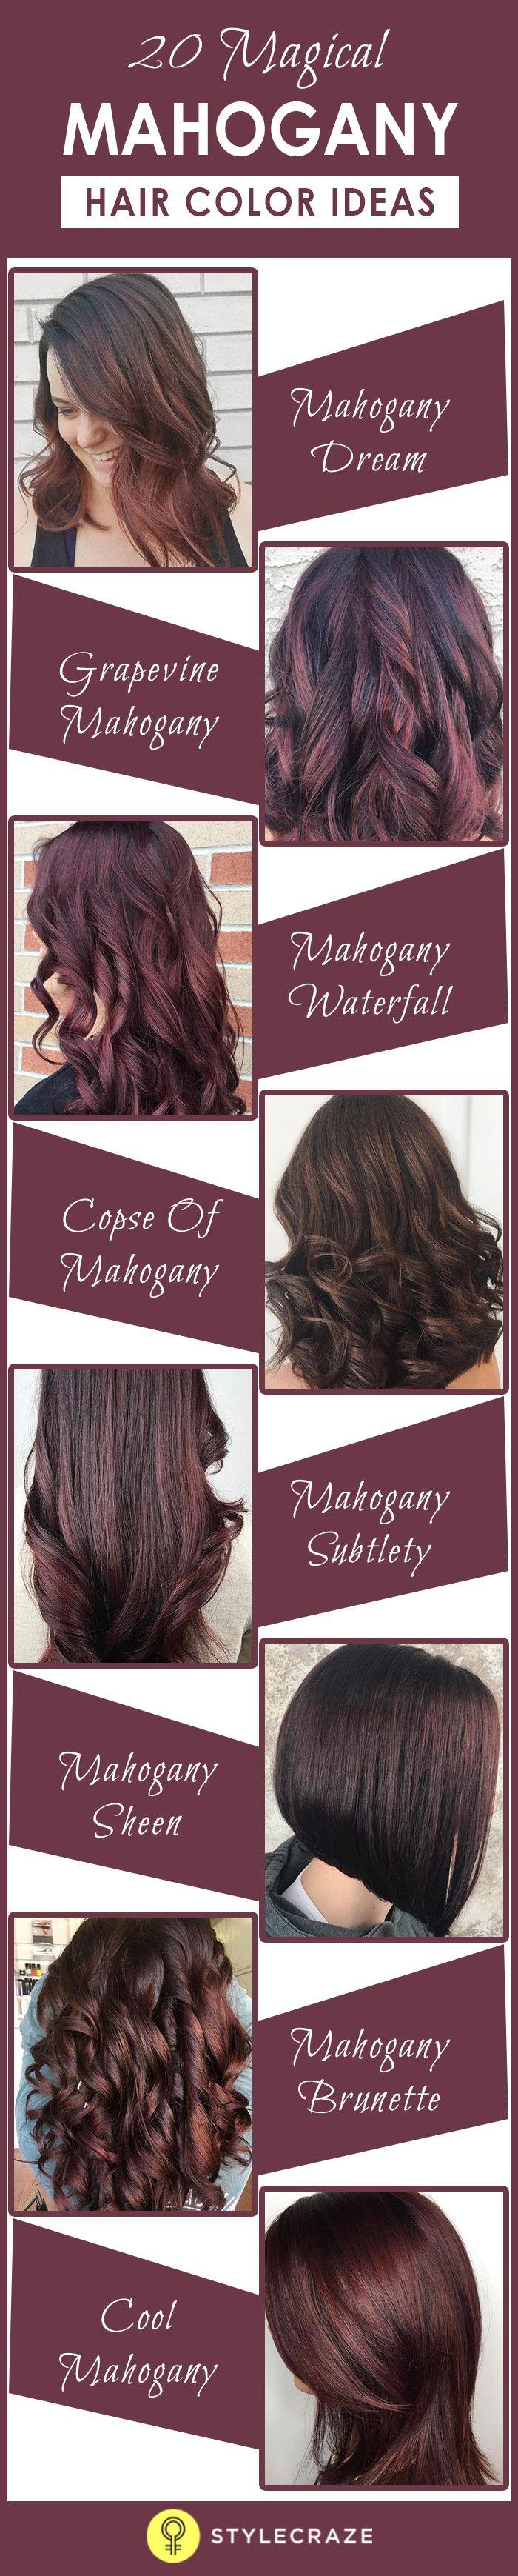 20 Magical Mahogany Hair Color Ideas